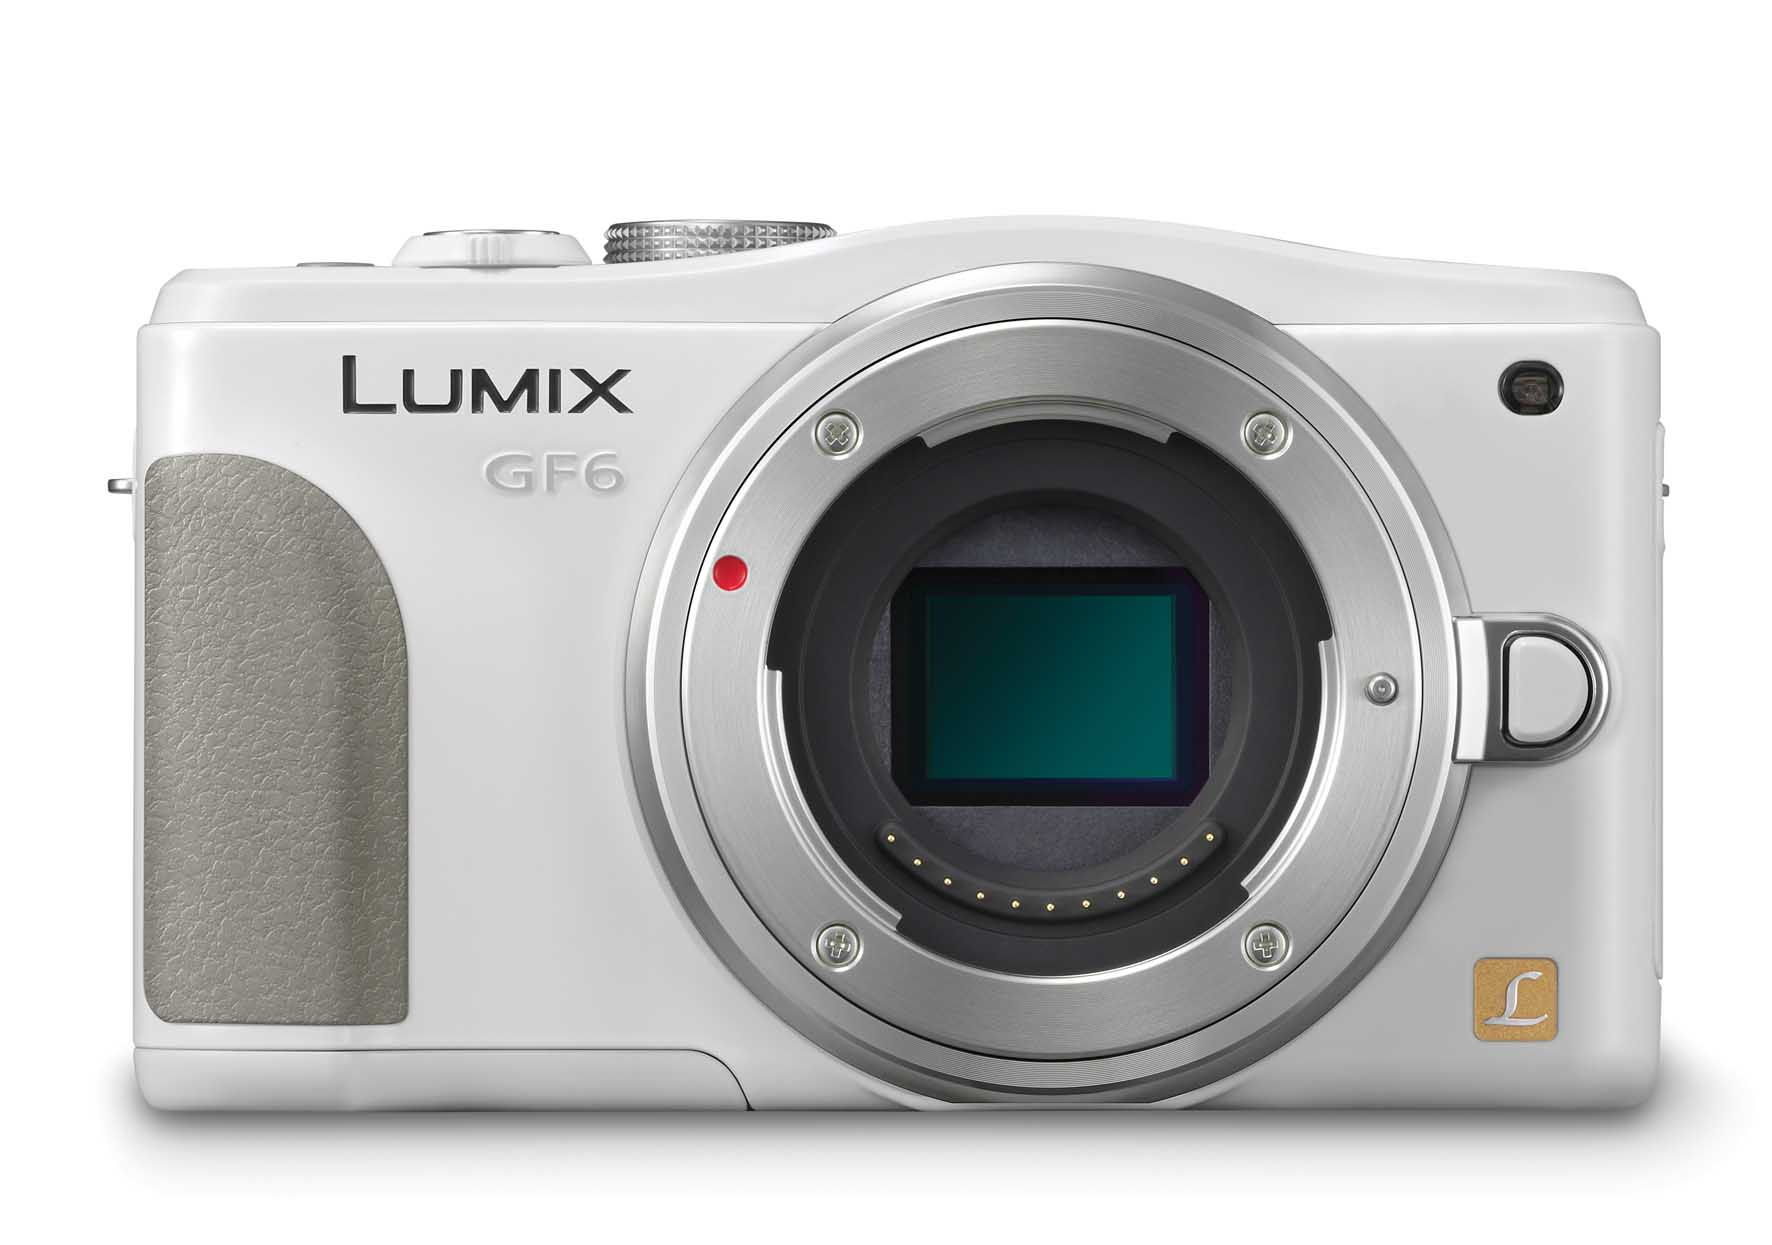 Lumix GF6 front 1